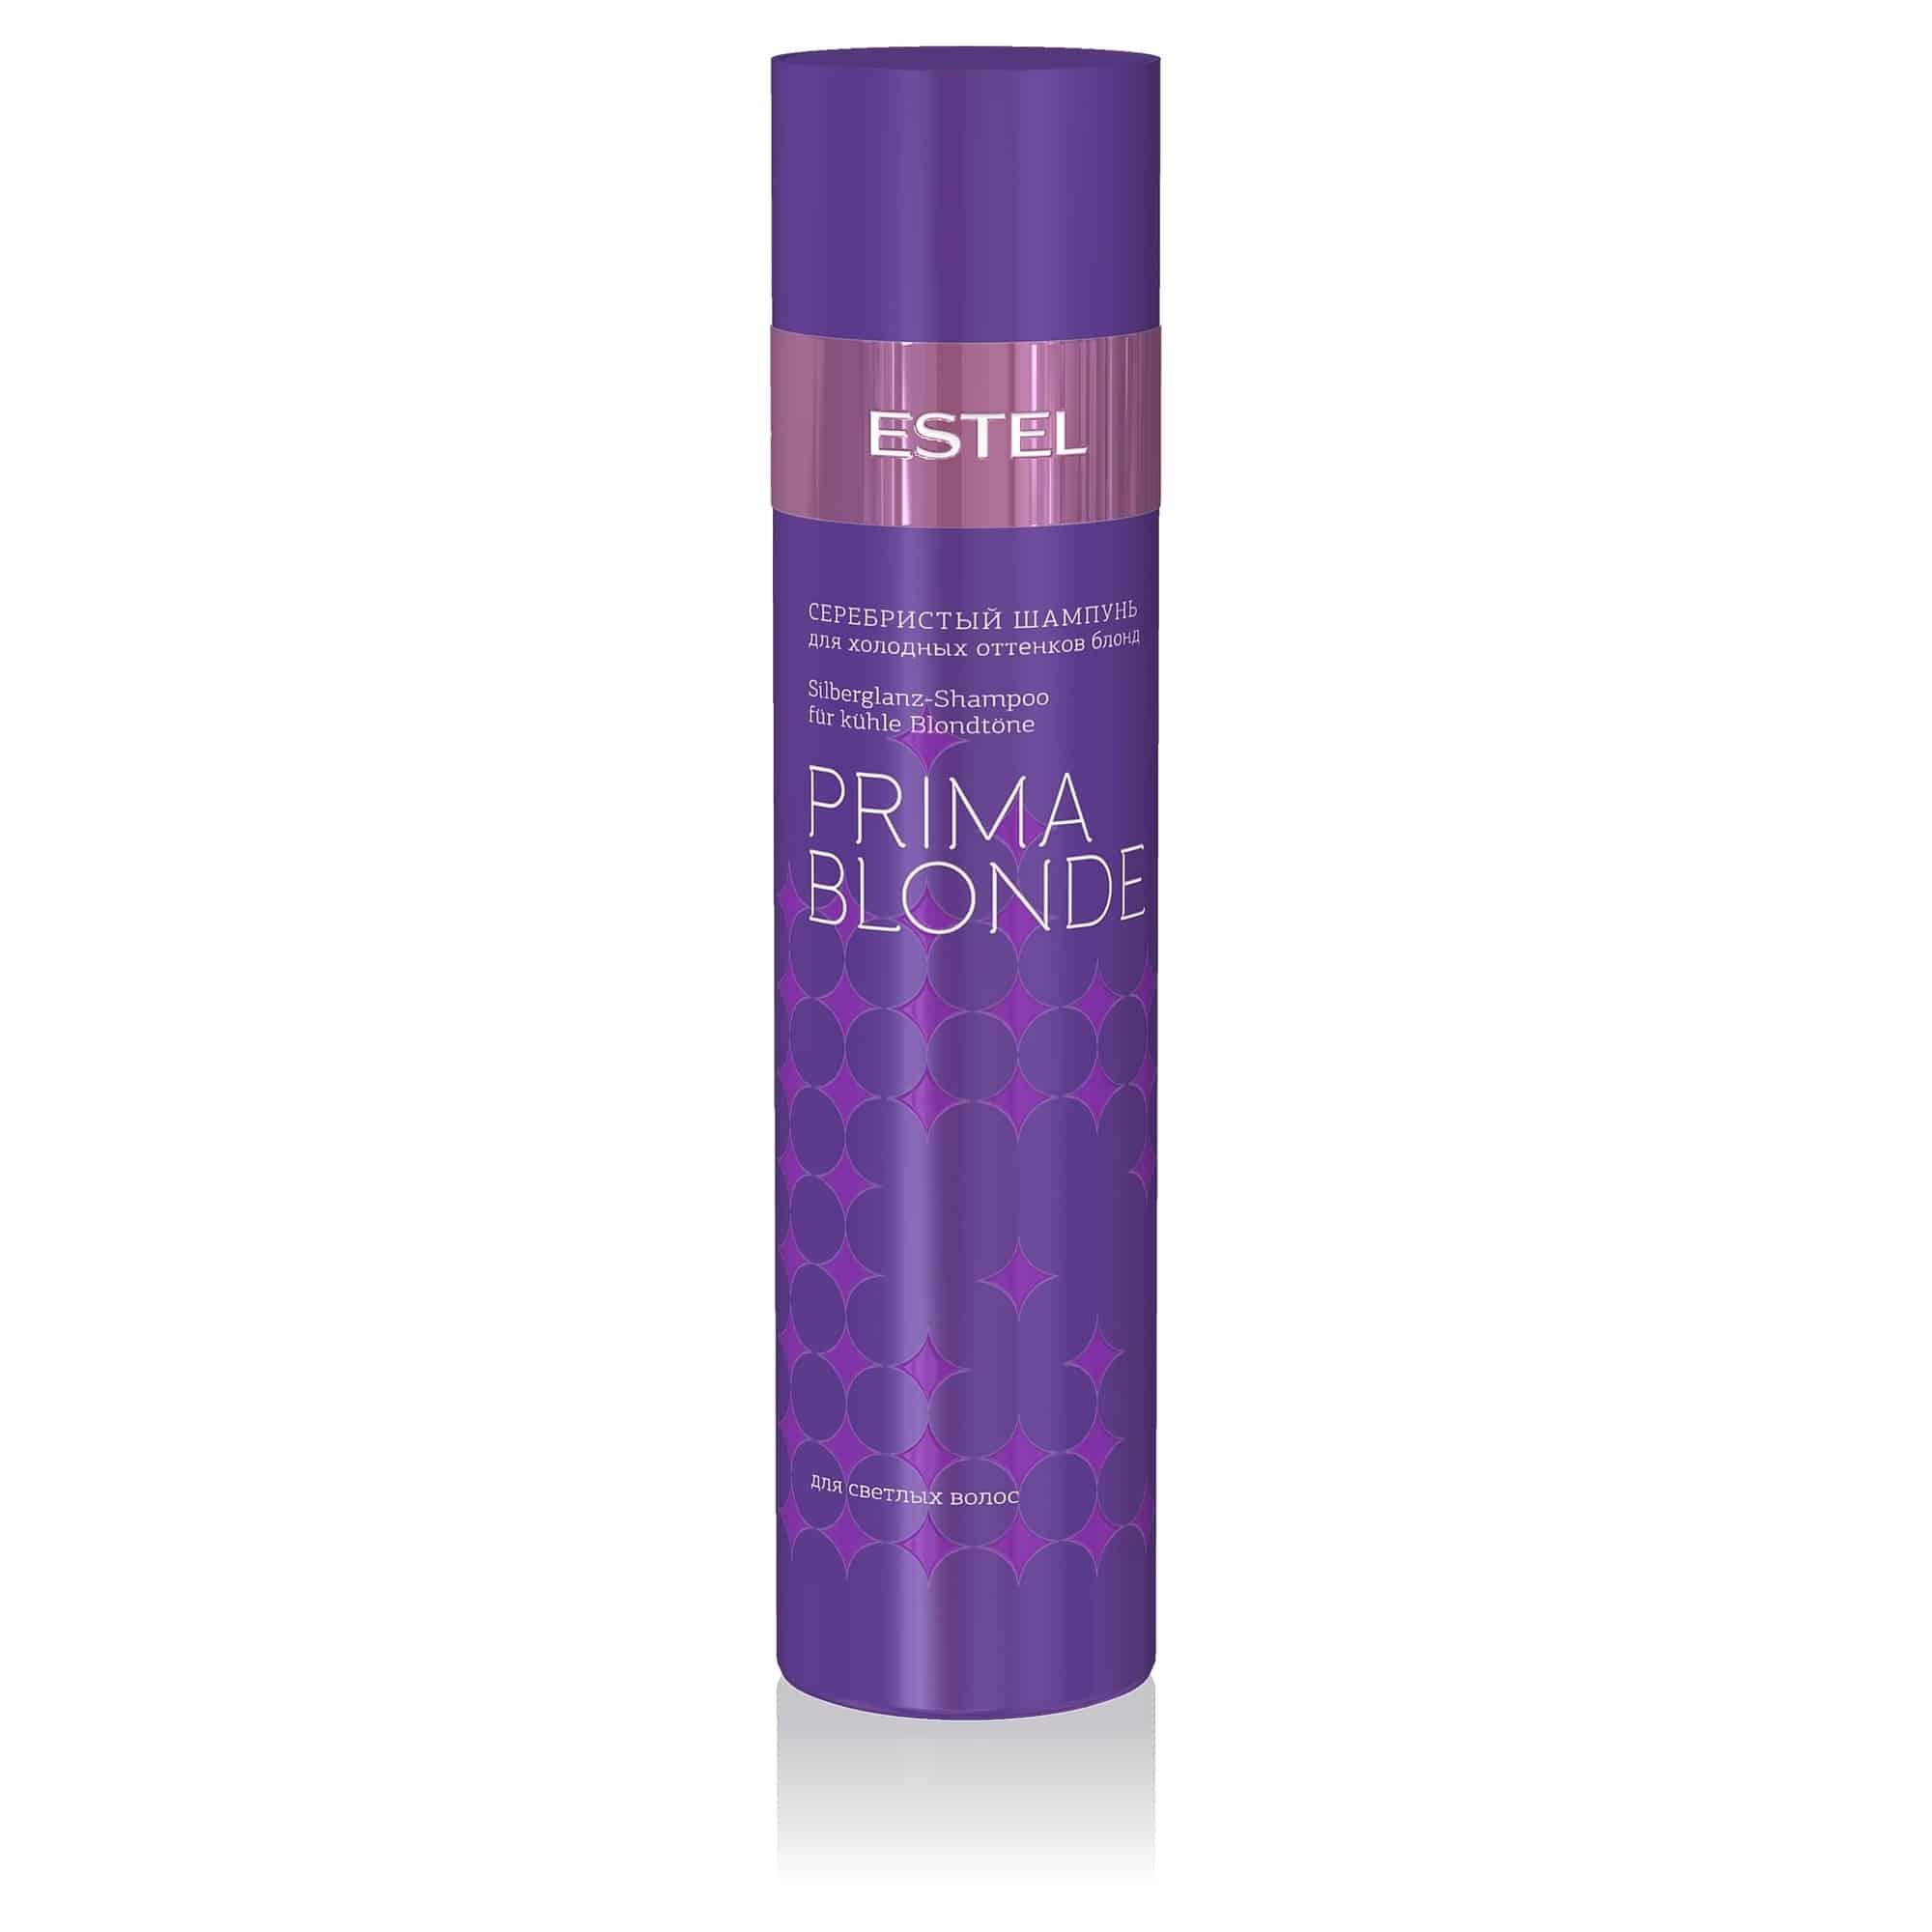 ESTEL PRIMA BLONDE Silberglanz-Shampoo